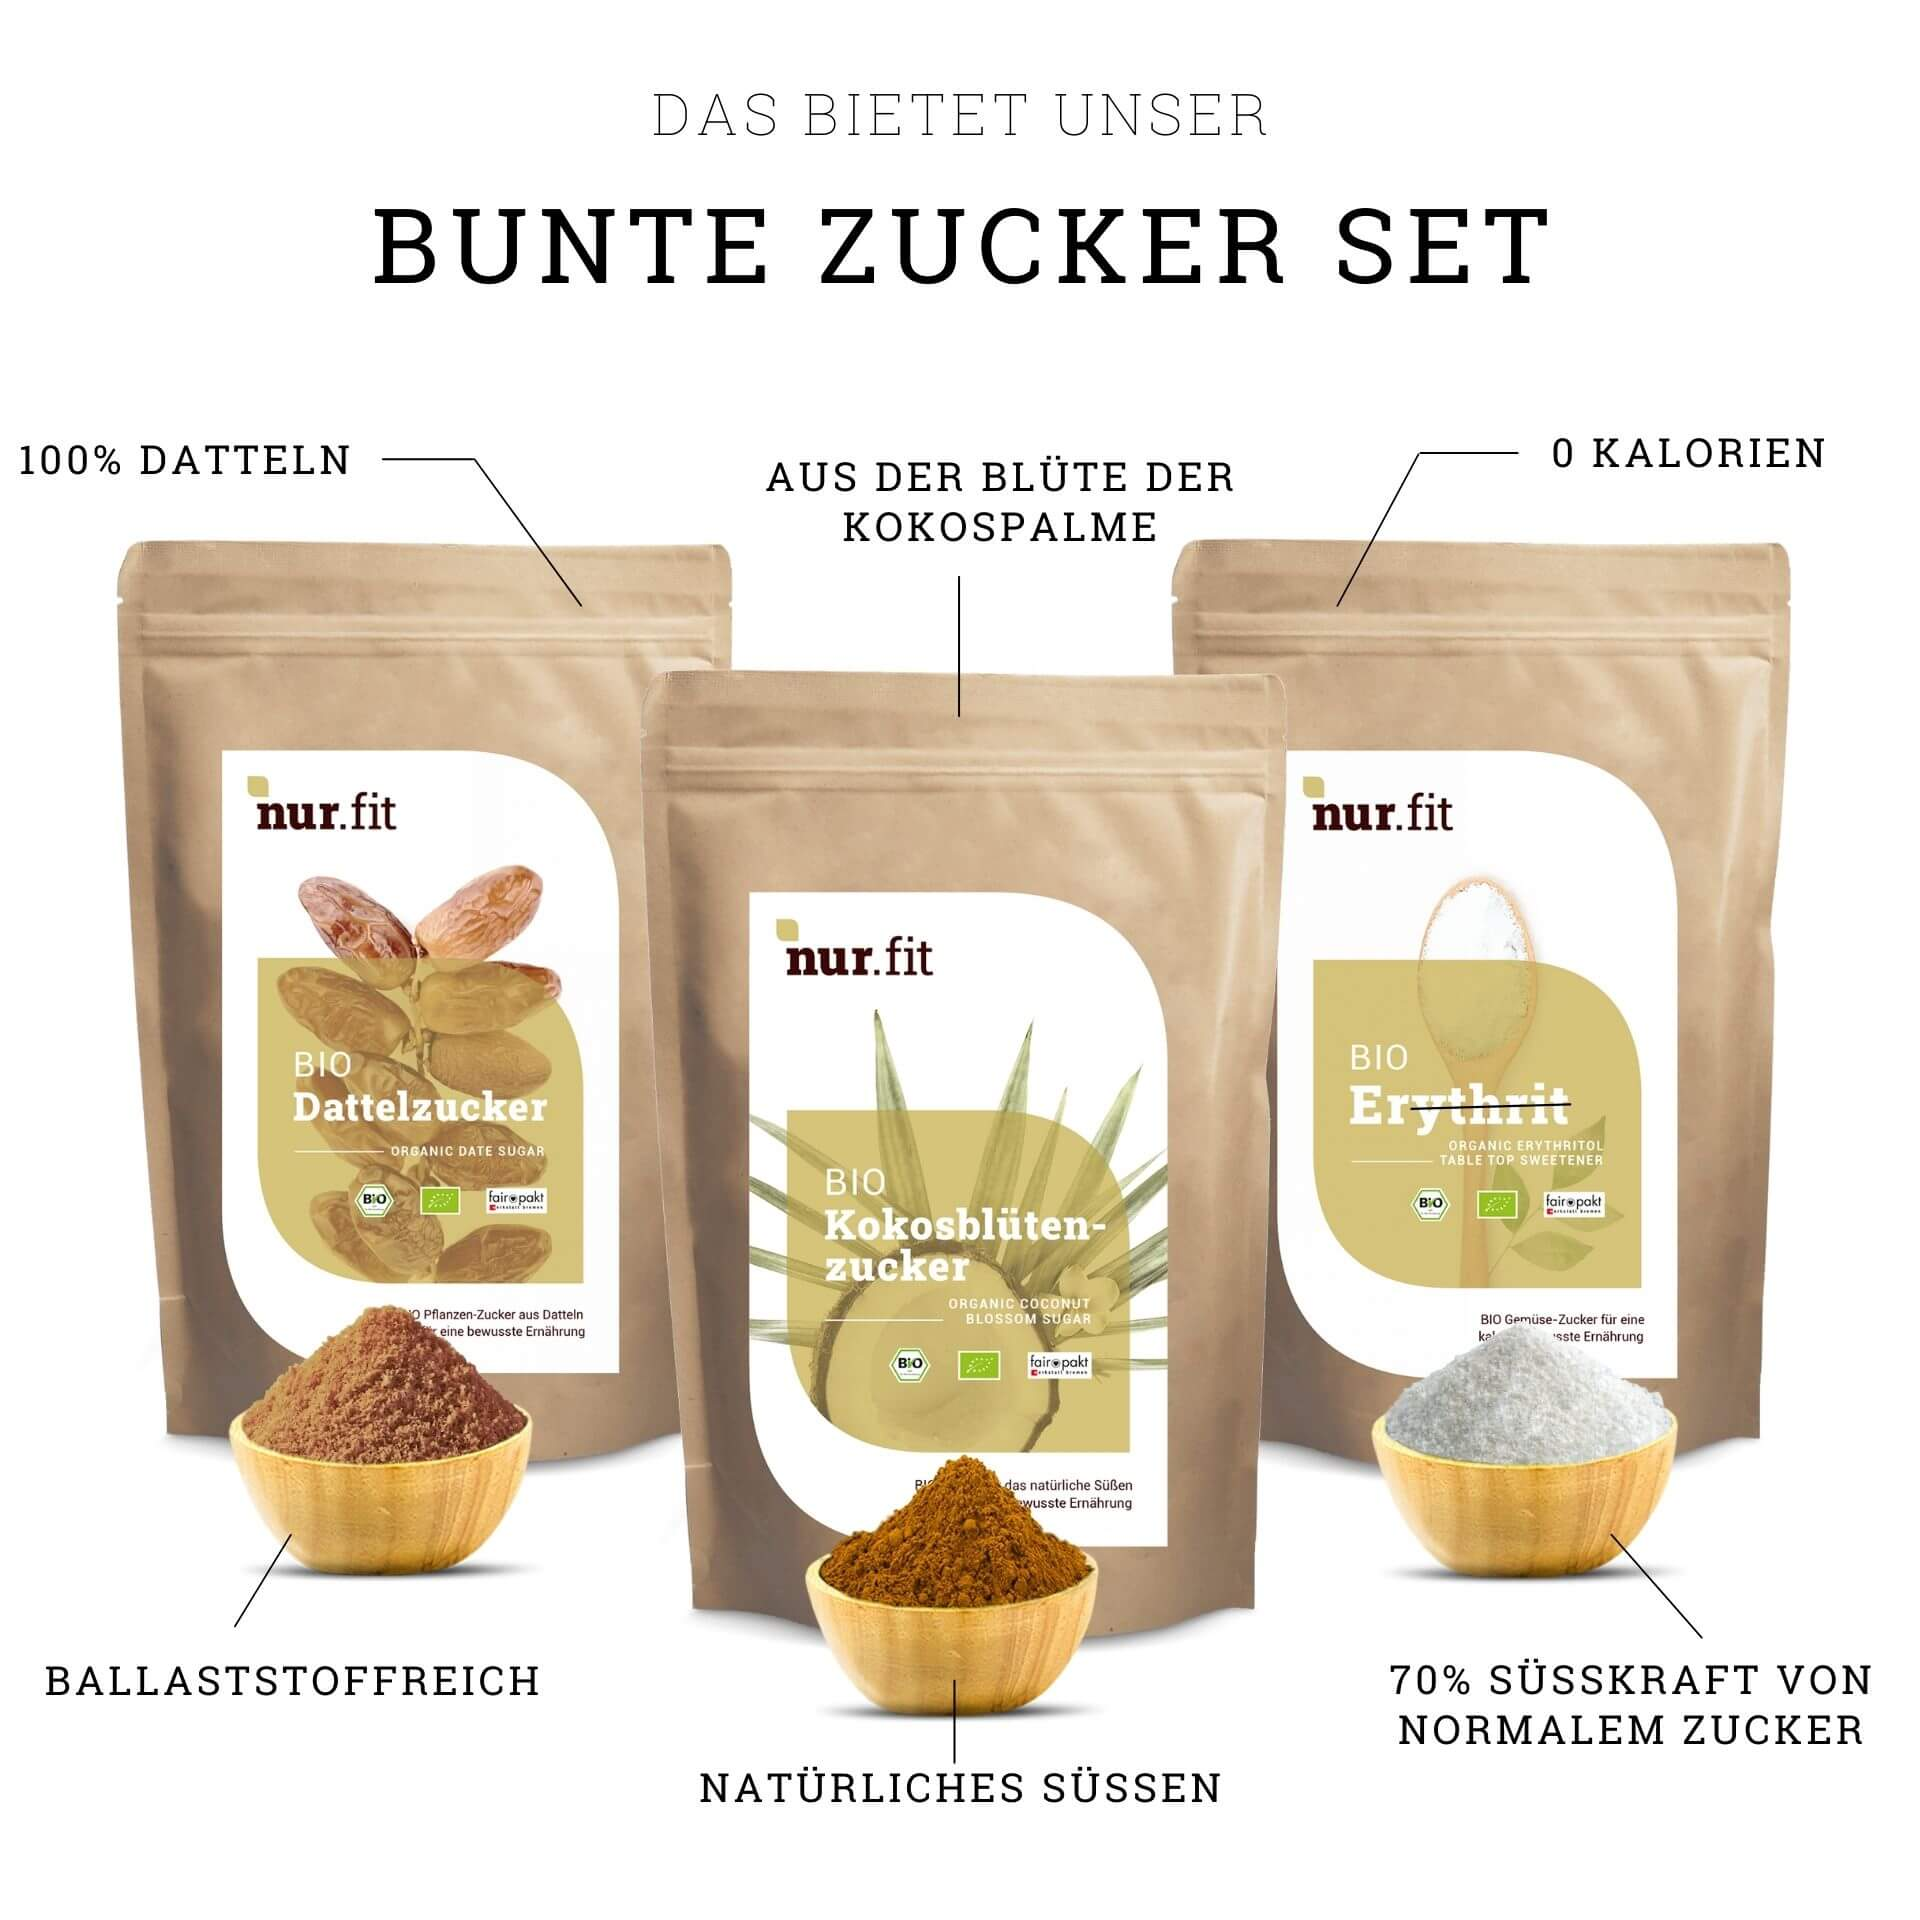 Bunte Zucker Set